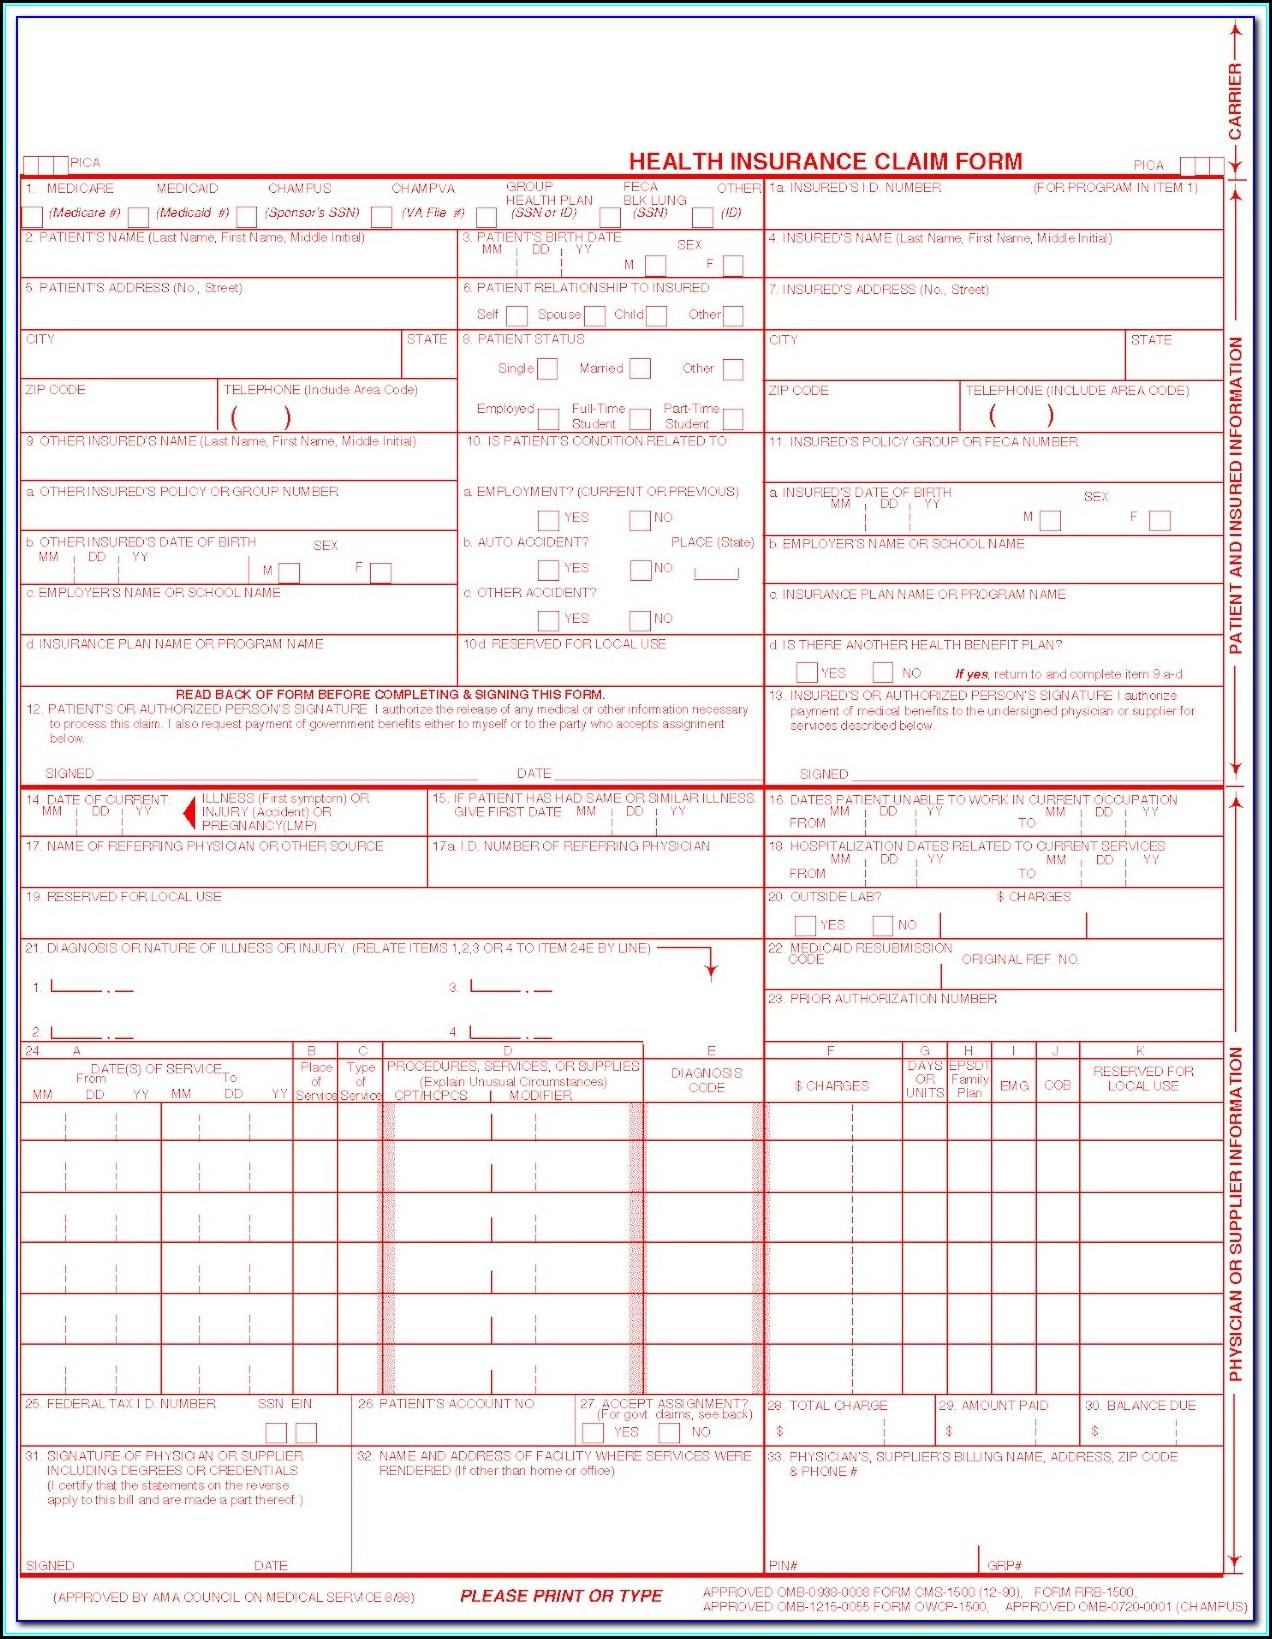 Hcfa 1500 Form 2017 Pdf Free